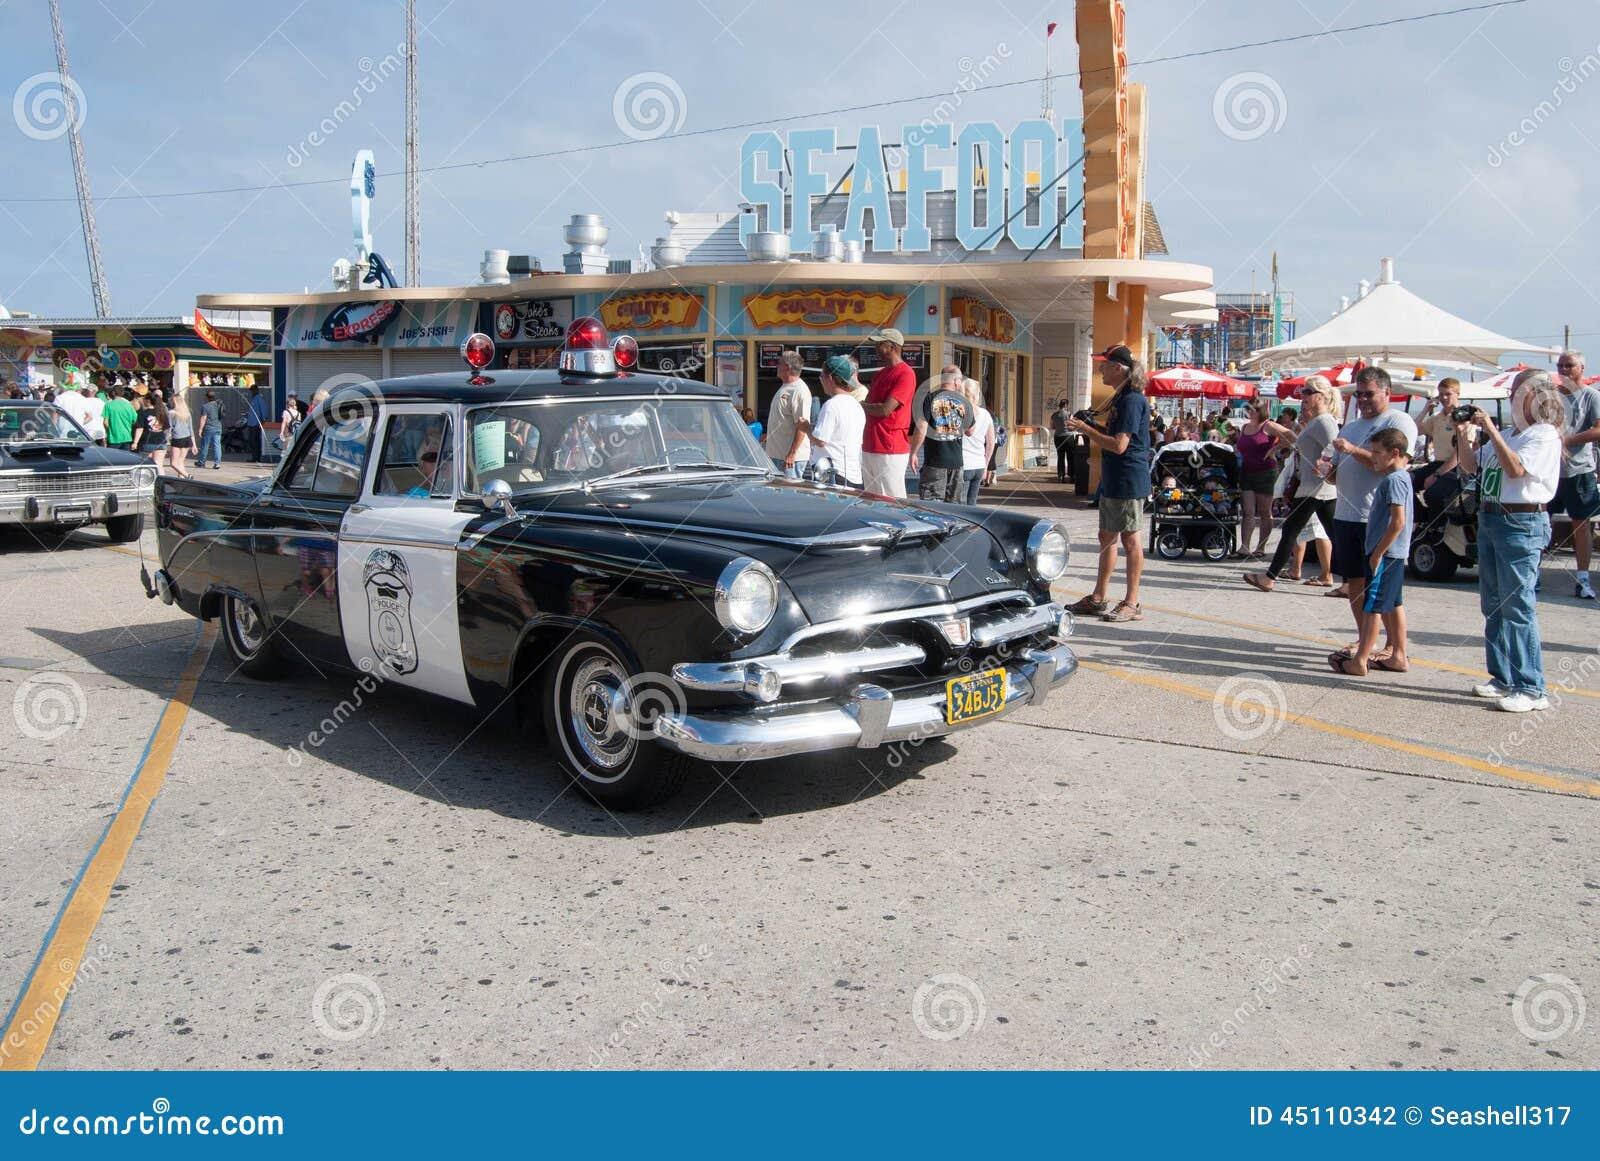 Wildwood Nj Classic Car Show